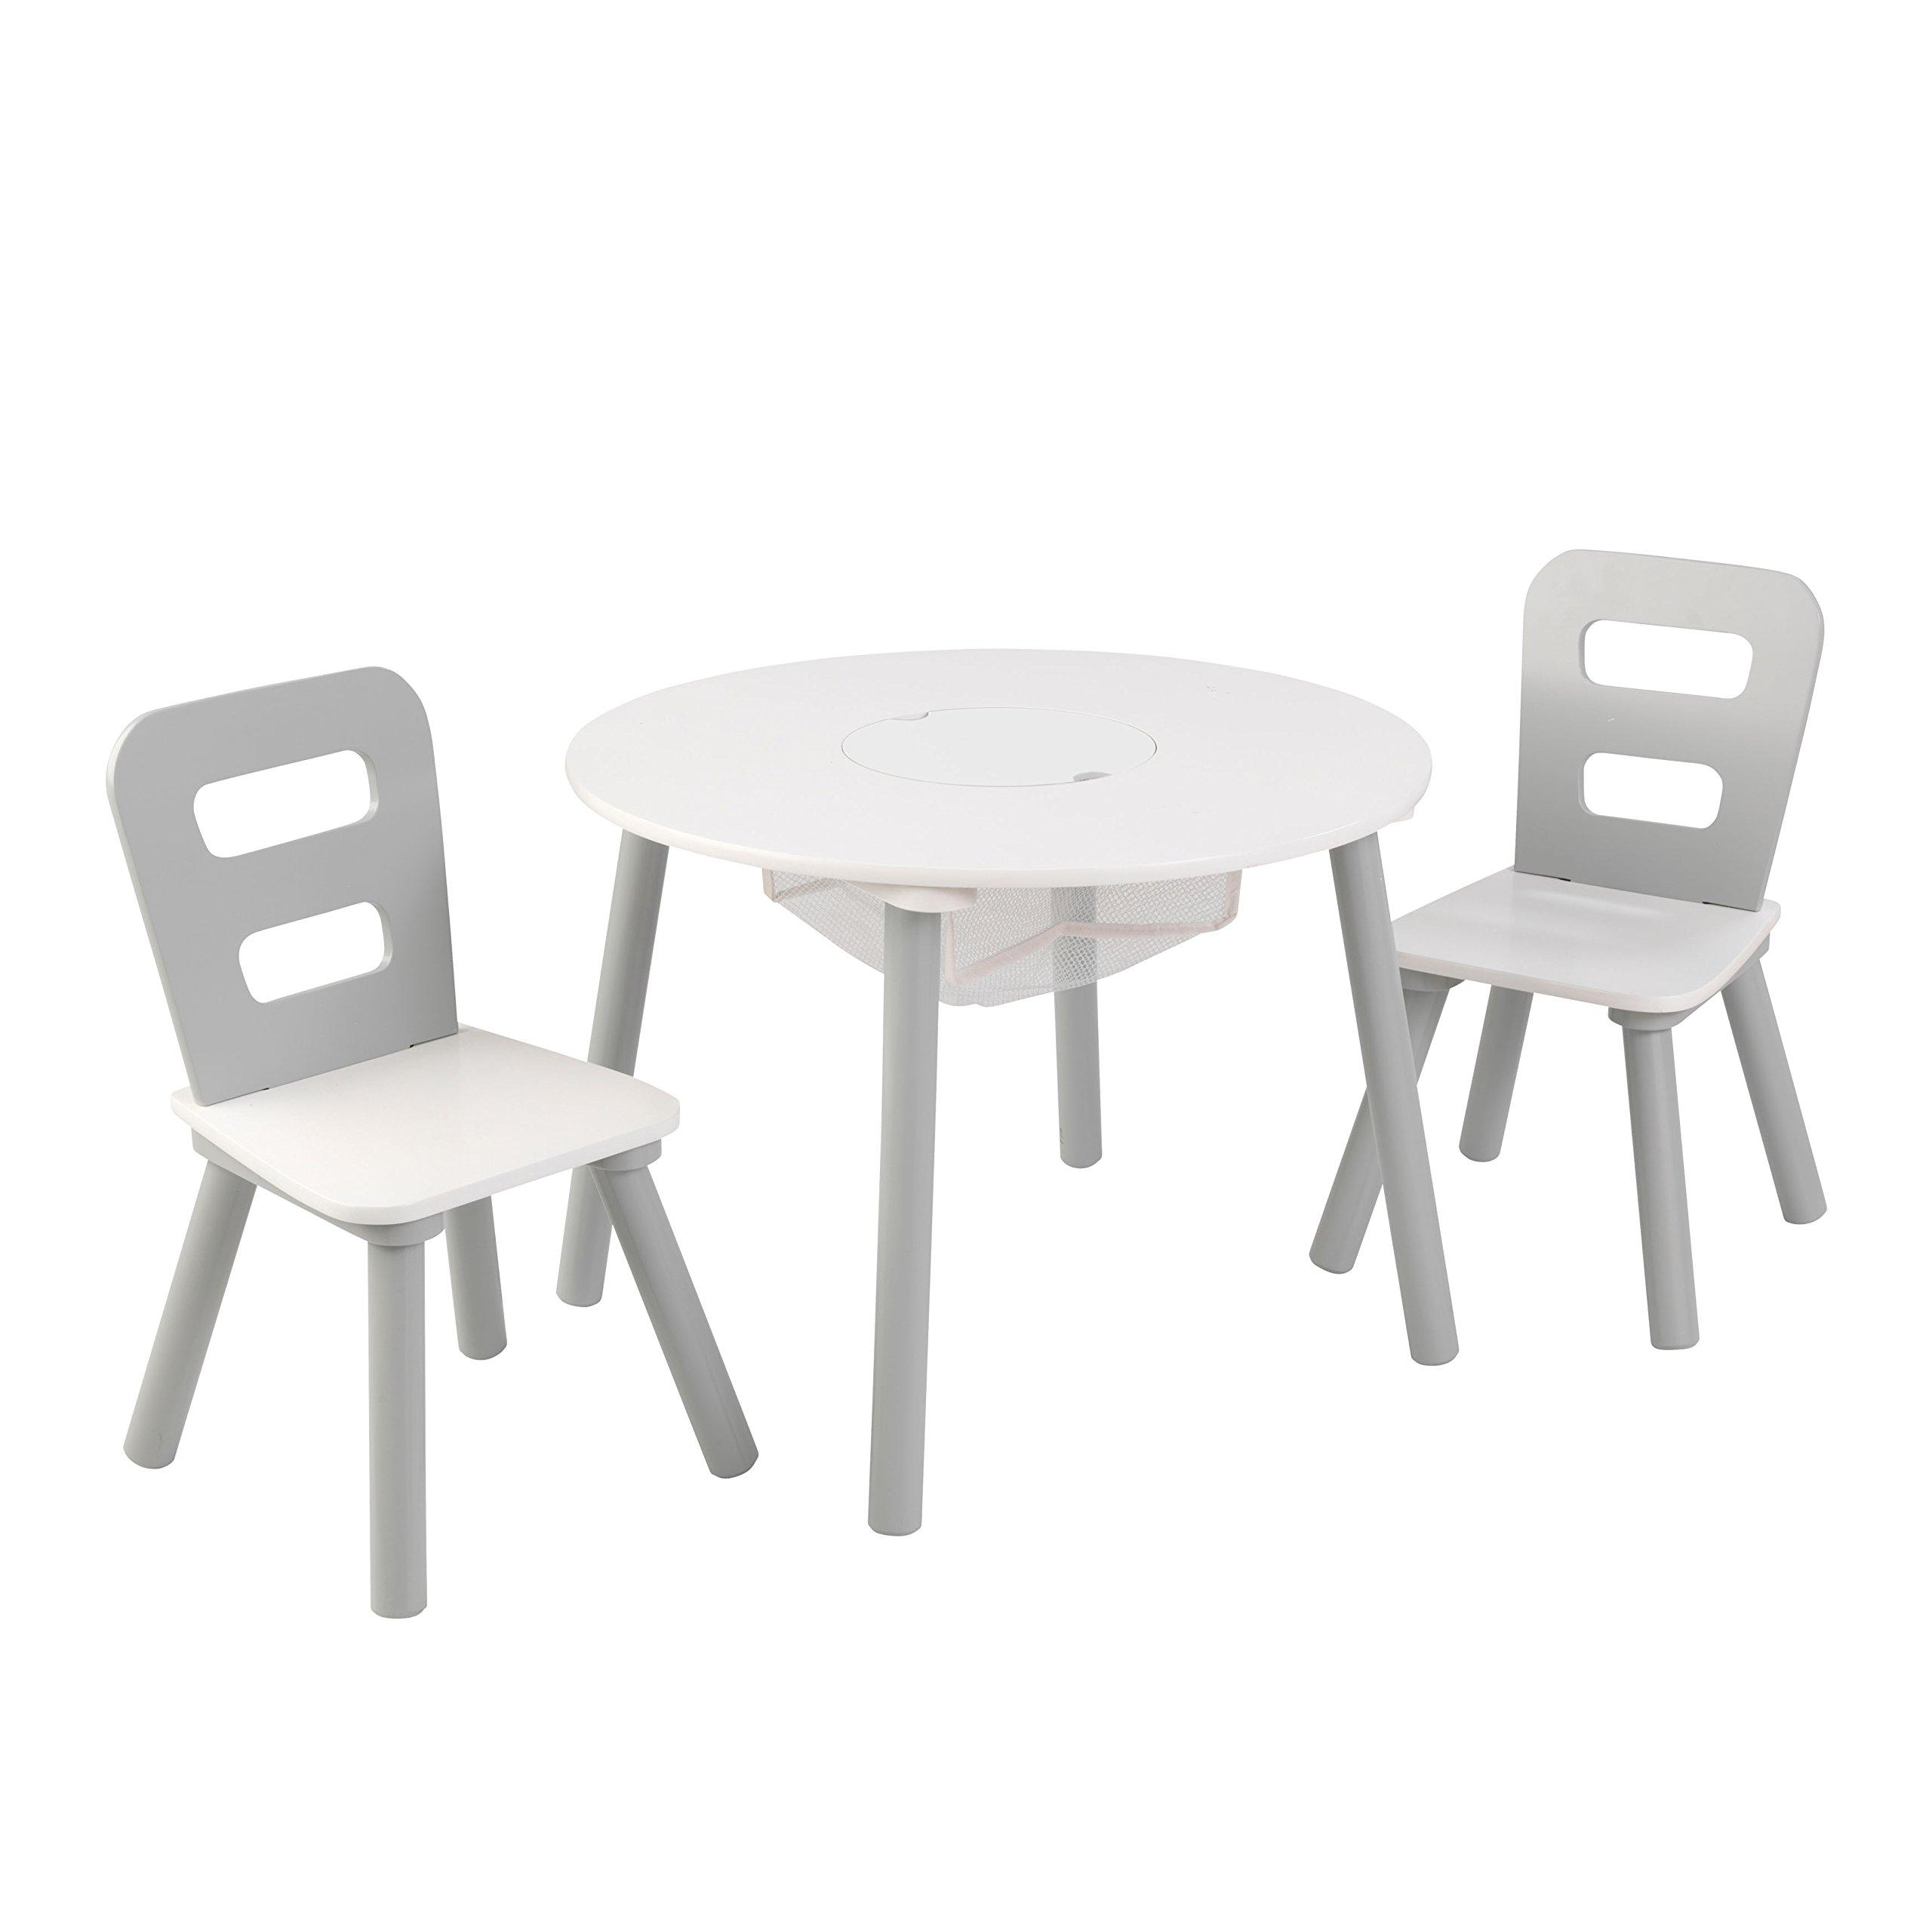 KidKraft Round Table & Chair Set Wht & Gray Others, White, Gray